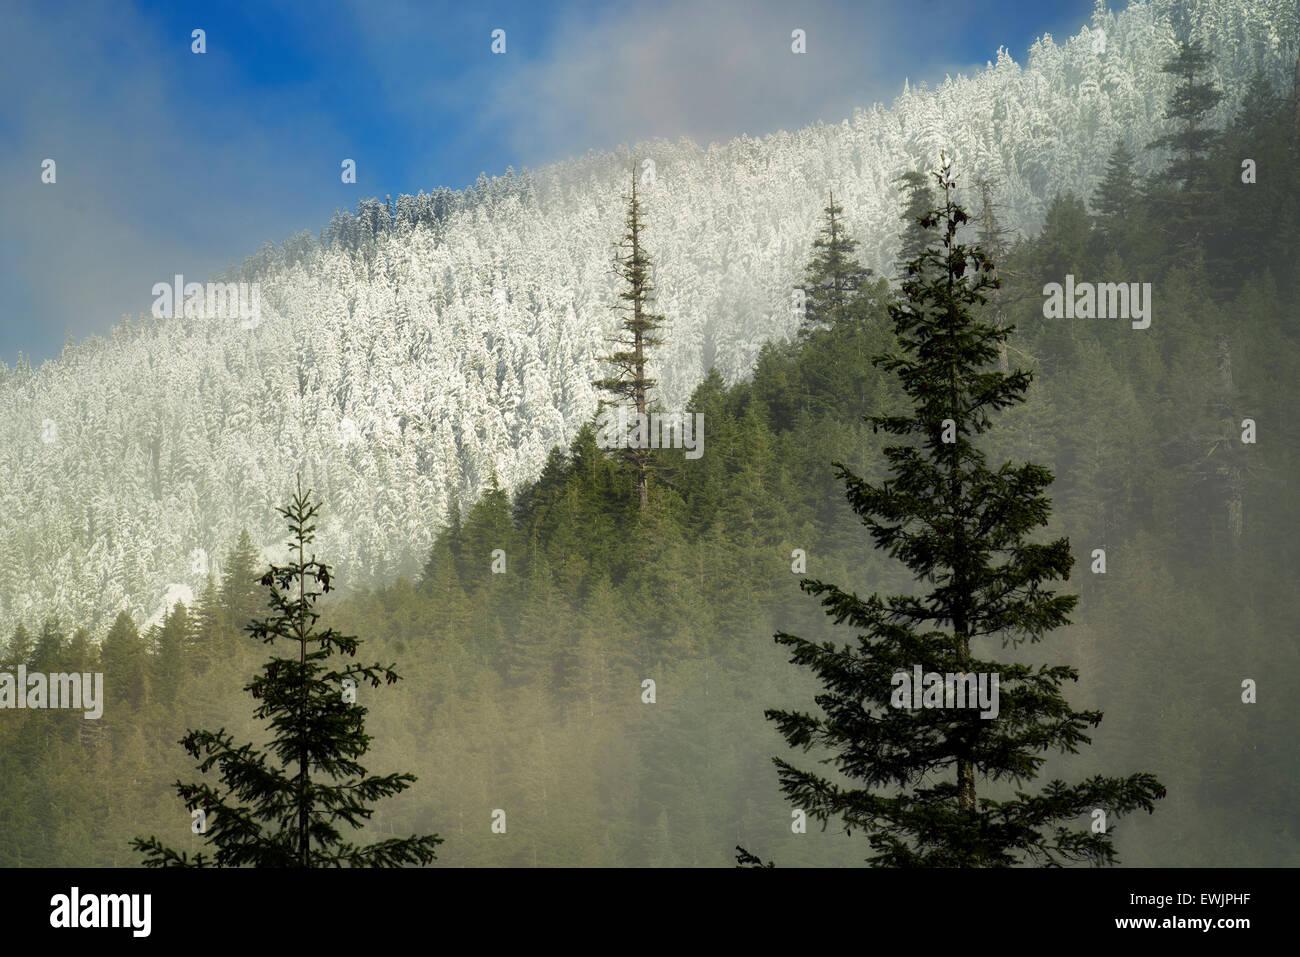 Primera nieve en las montañas cerca de Opal Creek. Oregon Cascade Mountains. Imagen De Stock